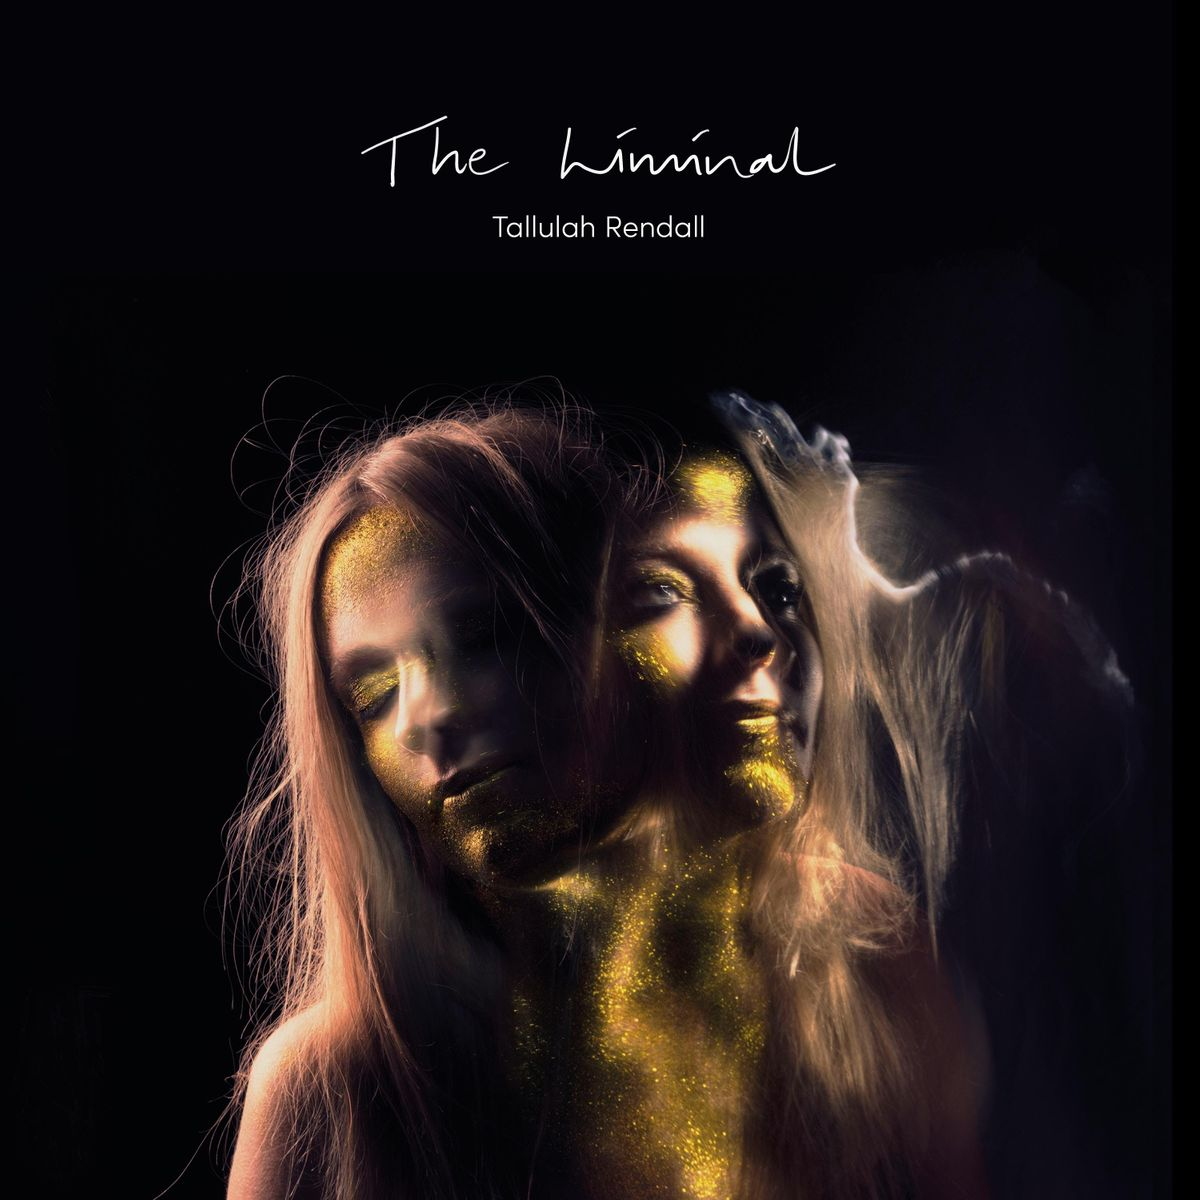 TALLULAH RENDALL - THE LIMINAL -  Sound bath  Album performance - Bristol